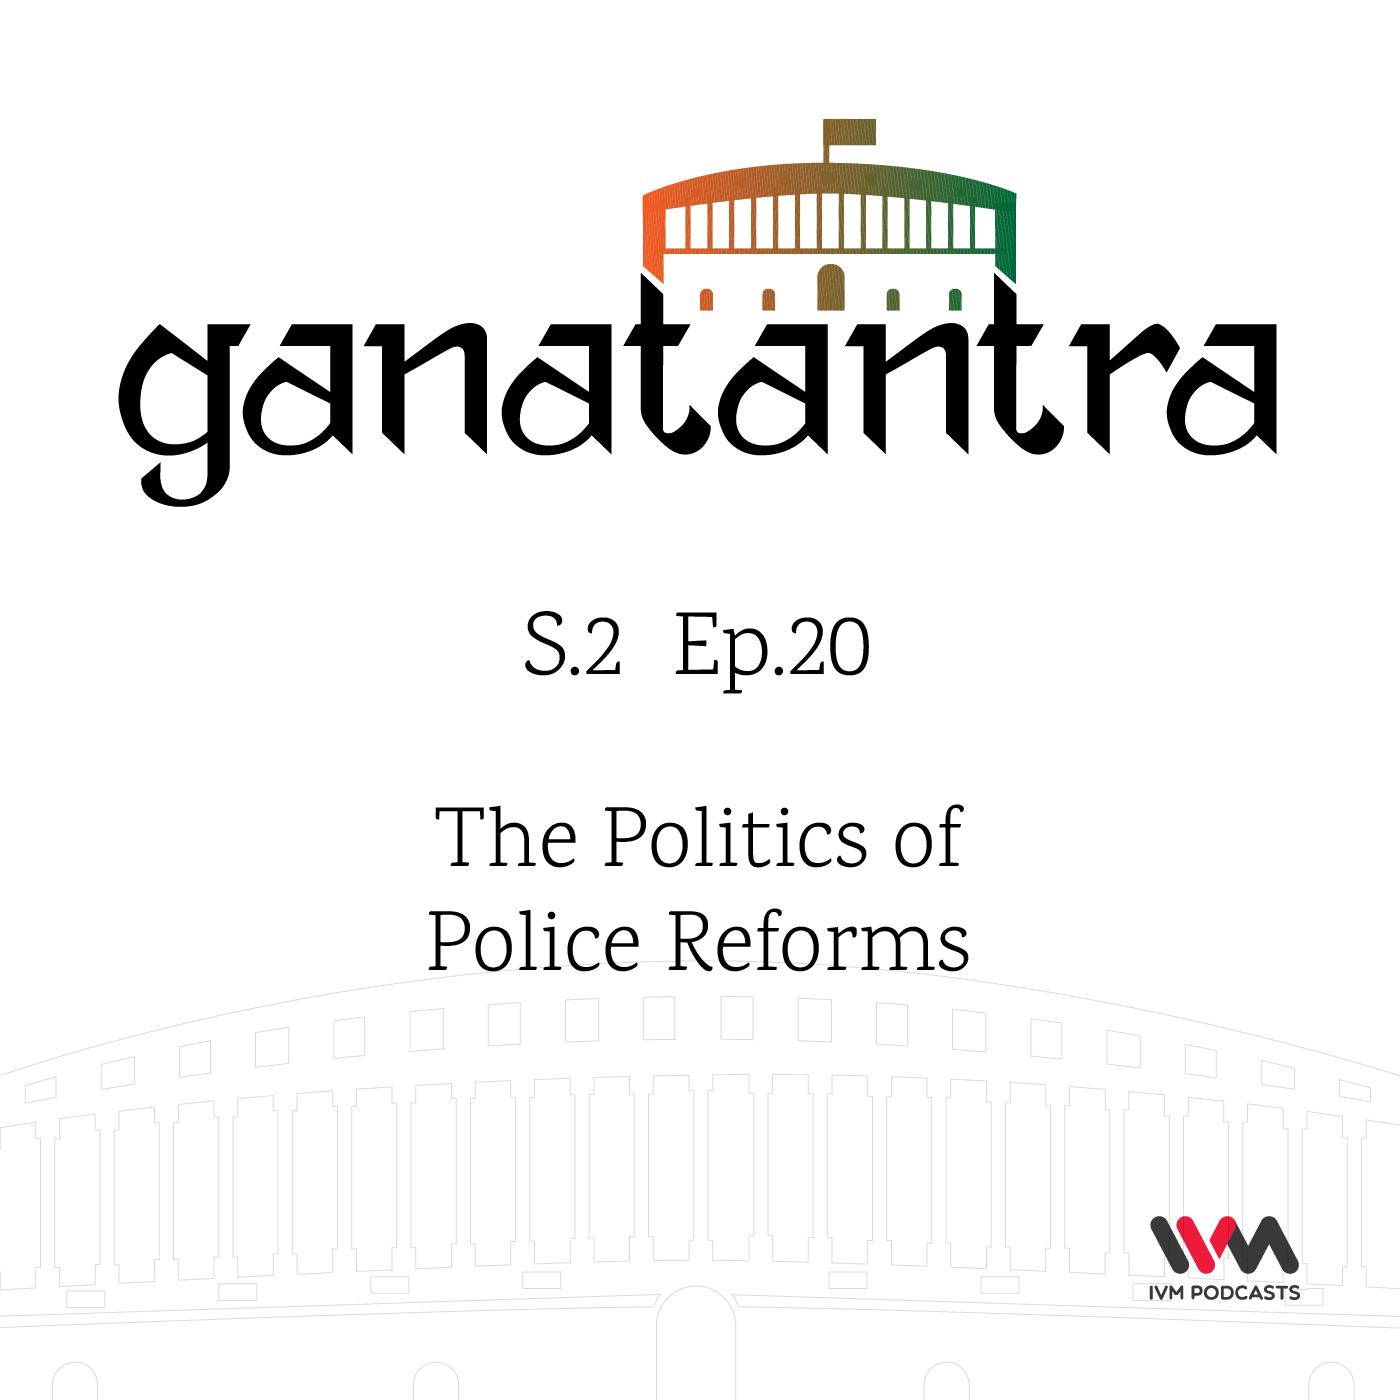 S02 E20: The Politics of Police Reforms